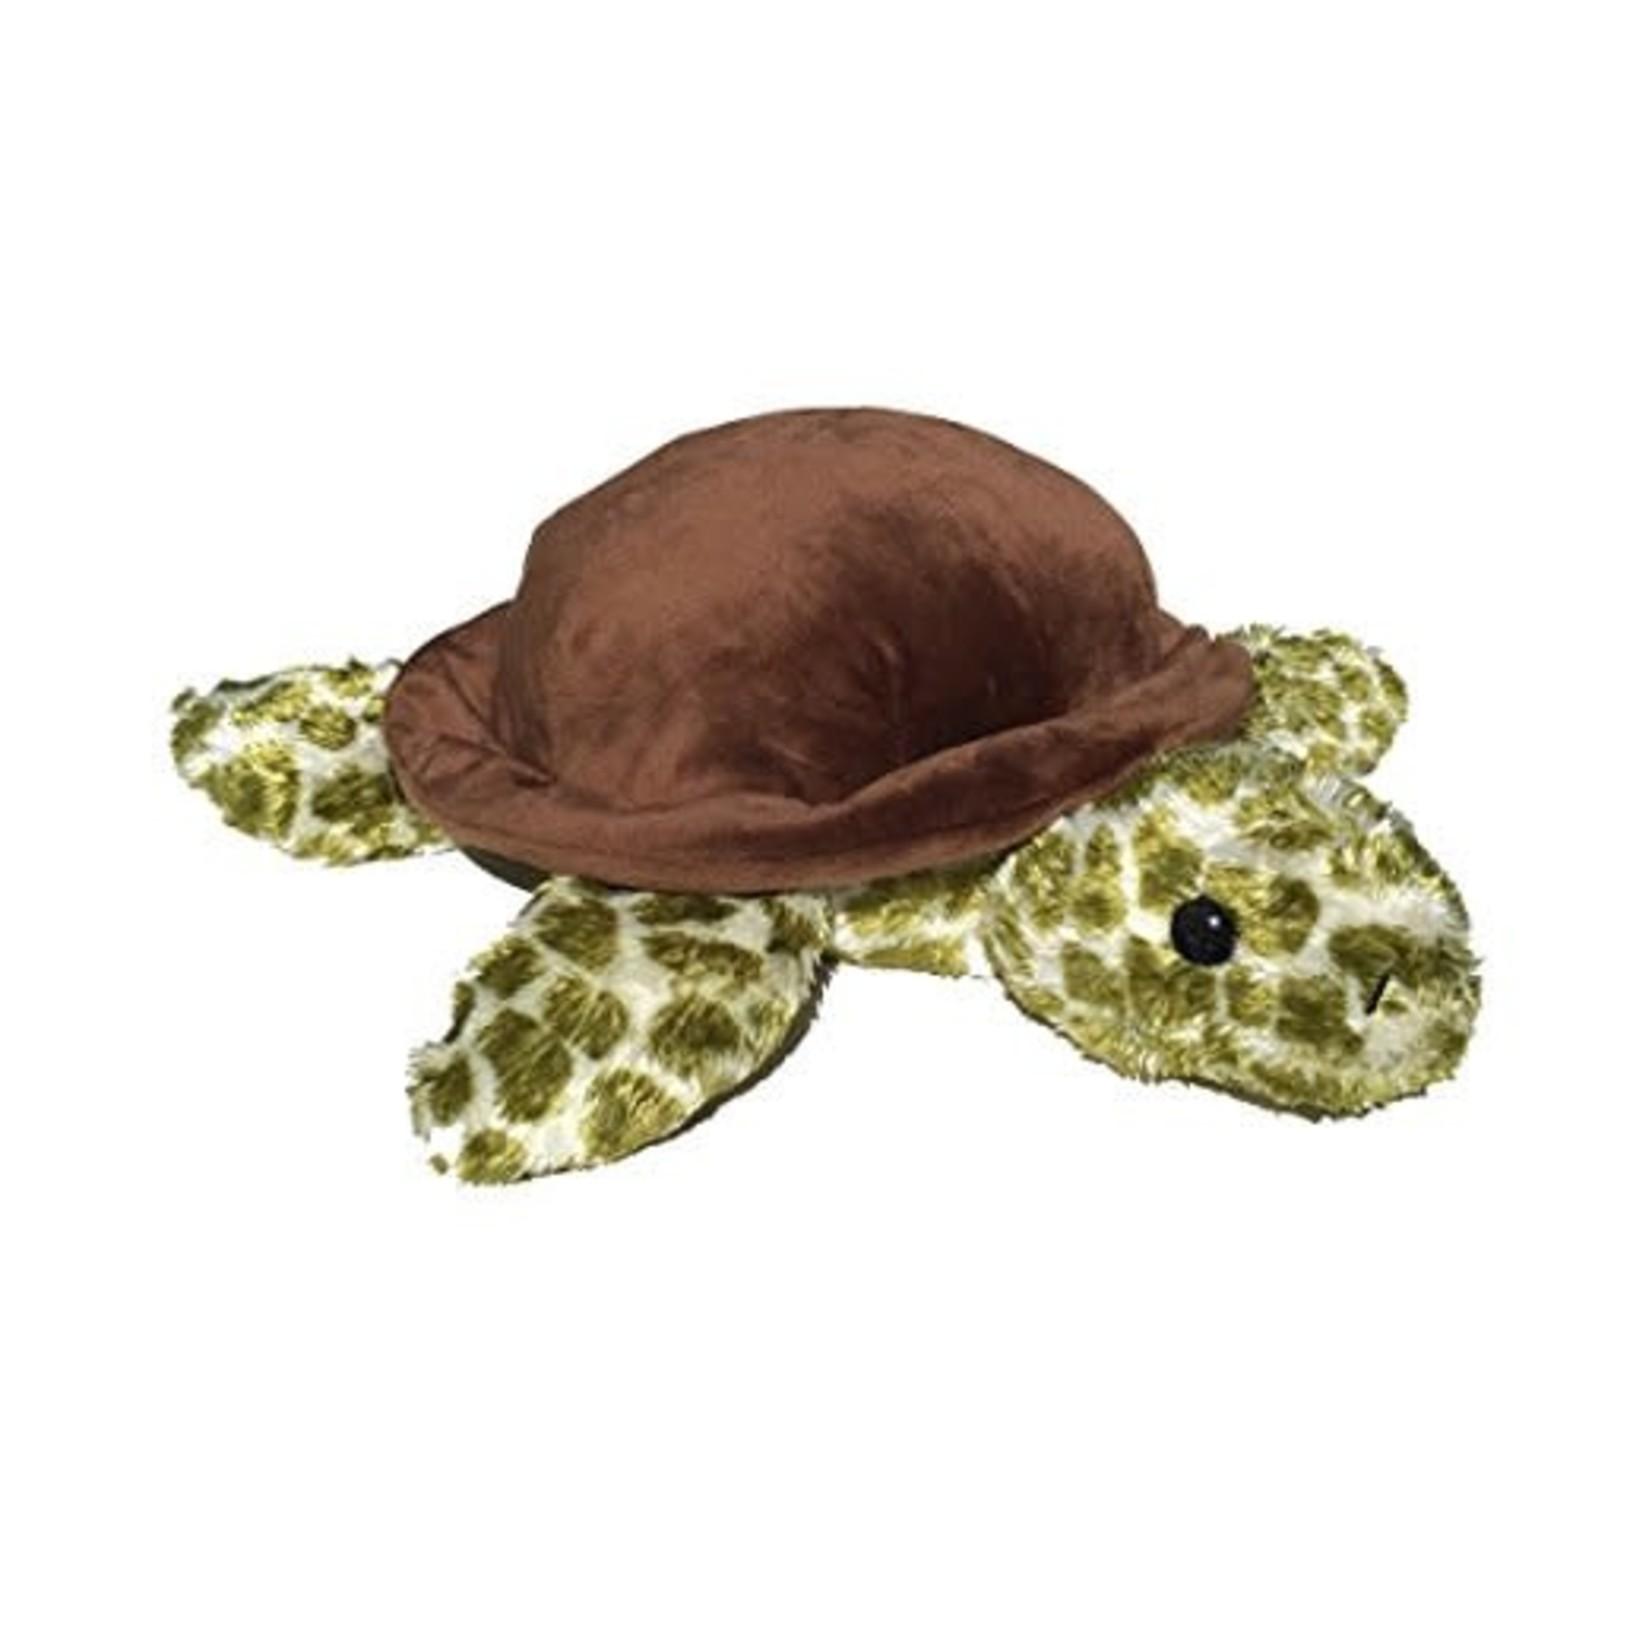 Intelex Big Turtle Cozy Plush